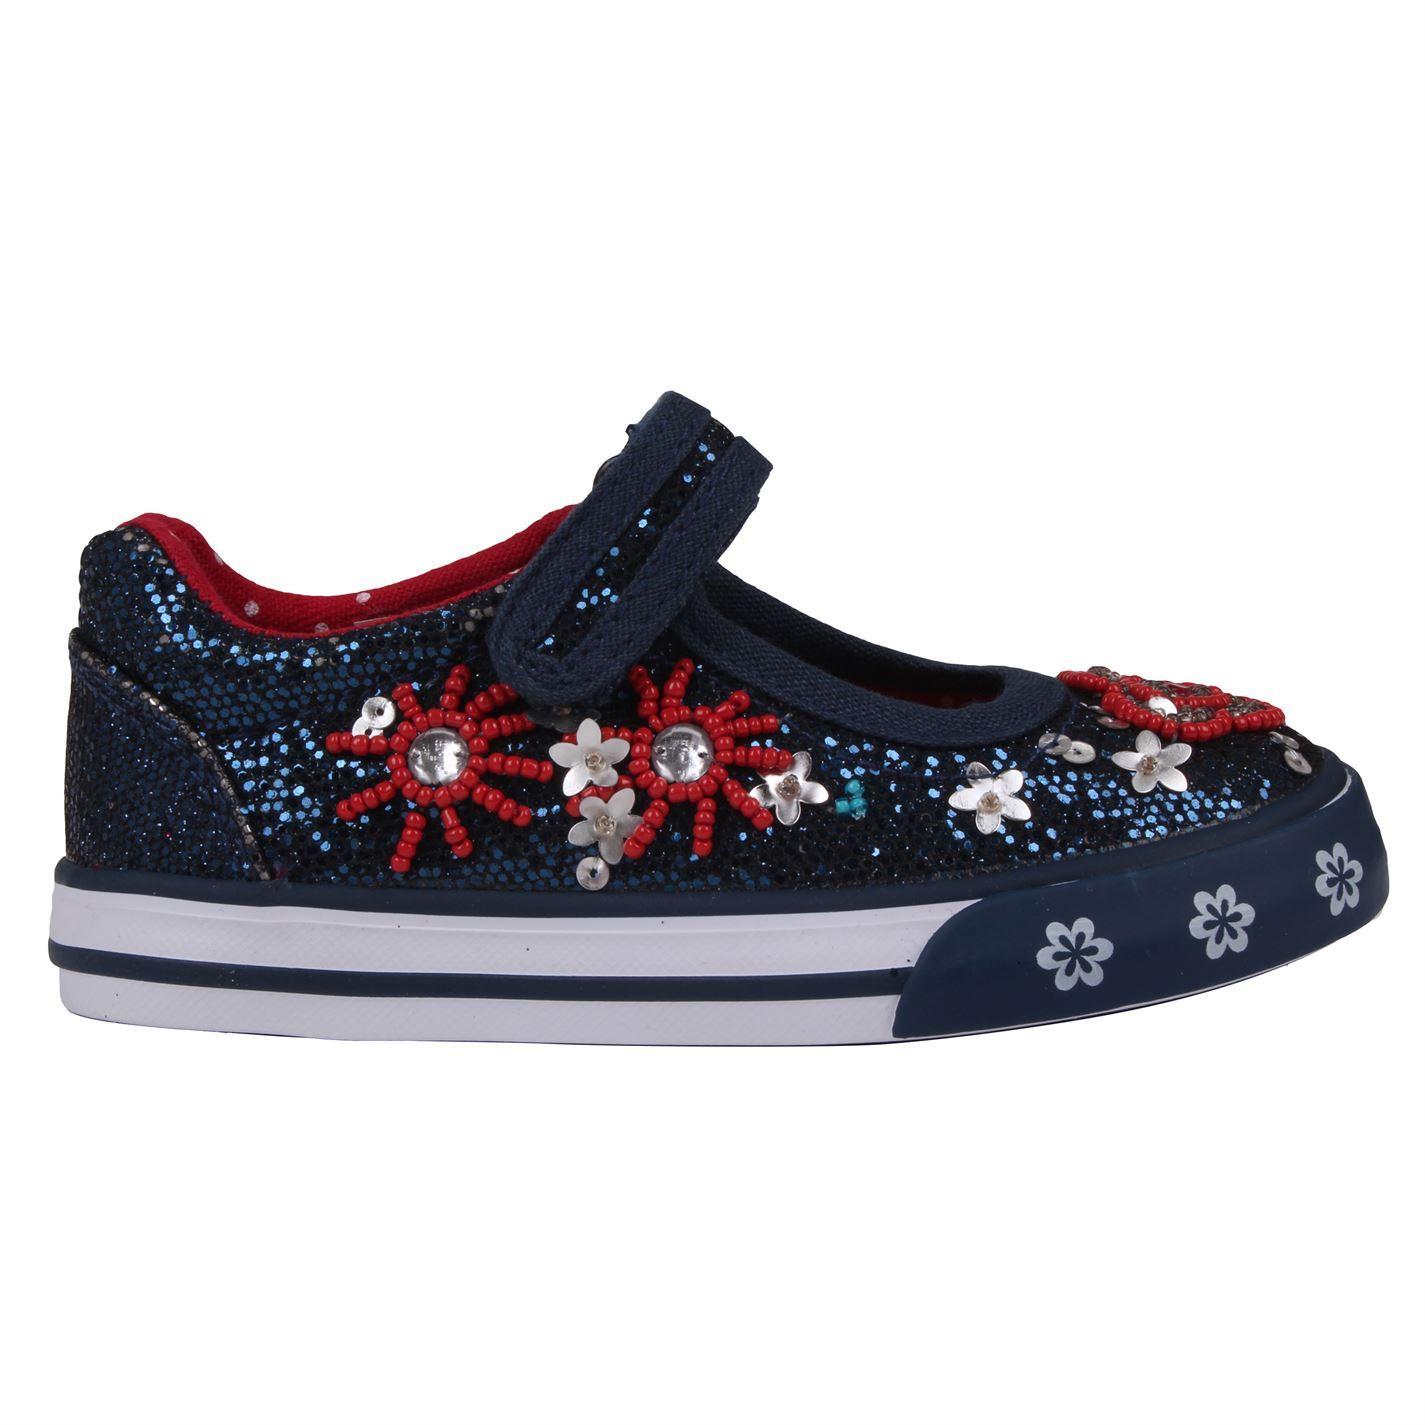 Miso Girls Beaded Ballet Baby Shoes Footwear Glitter Upper Synthetic